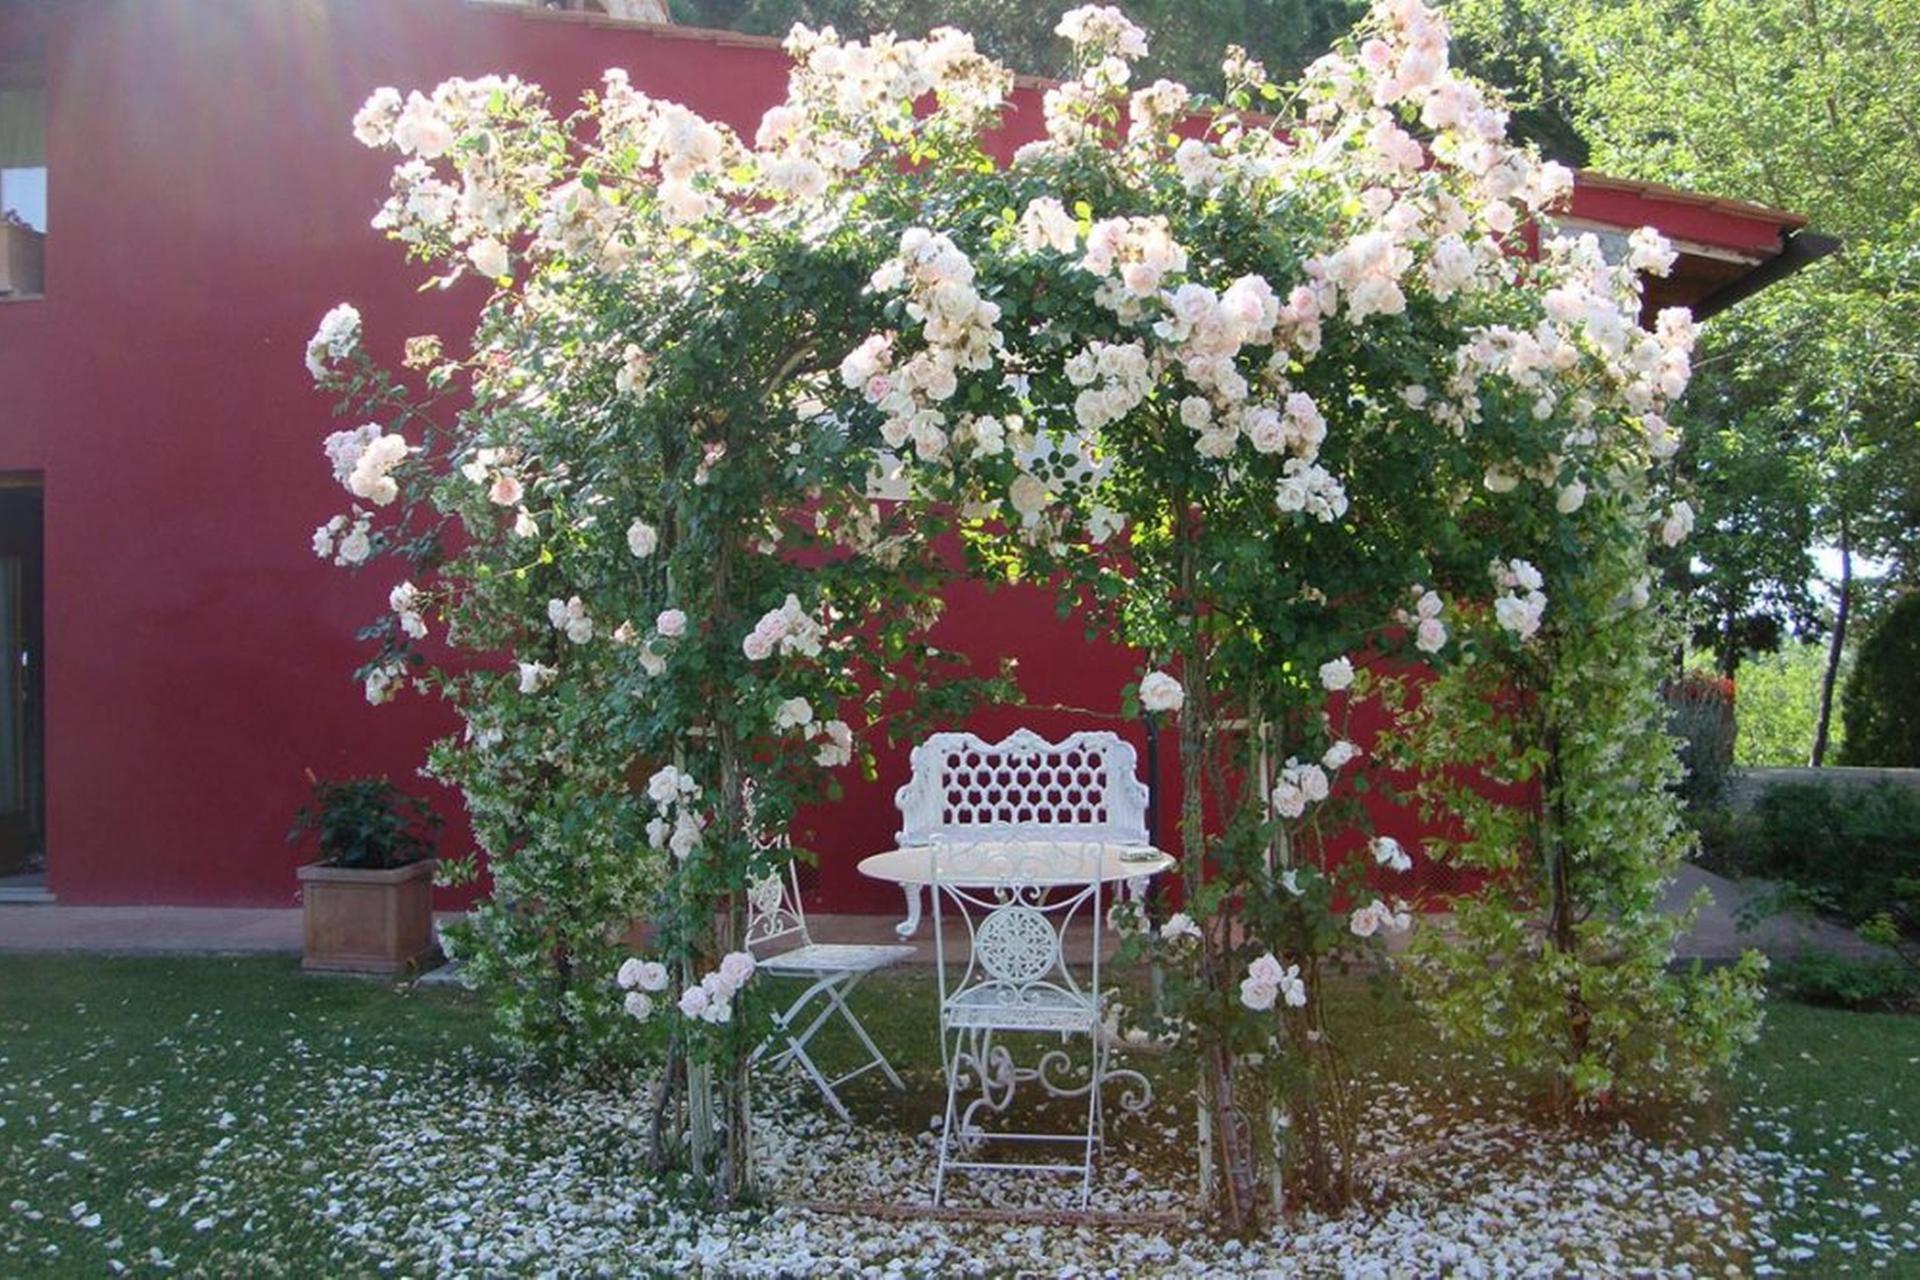 Agriturismo Tuscany Luxury agriturismo near the sea in Tuscany